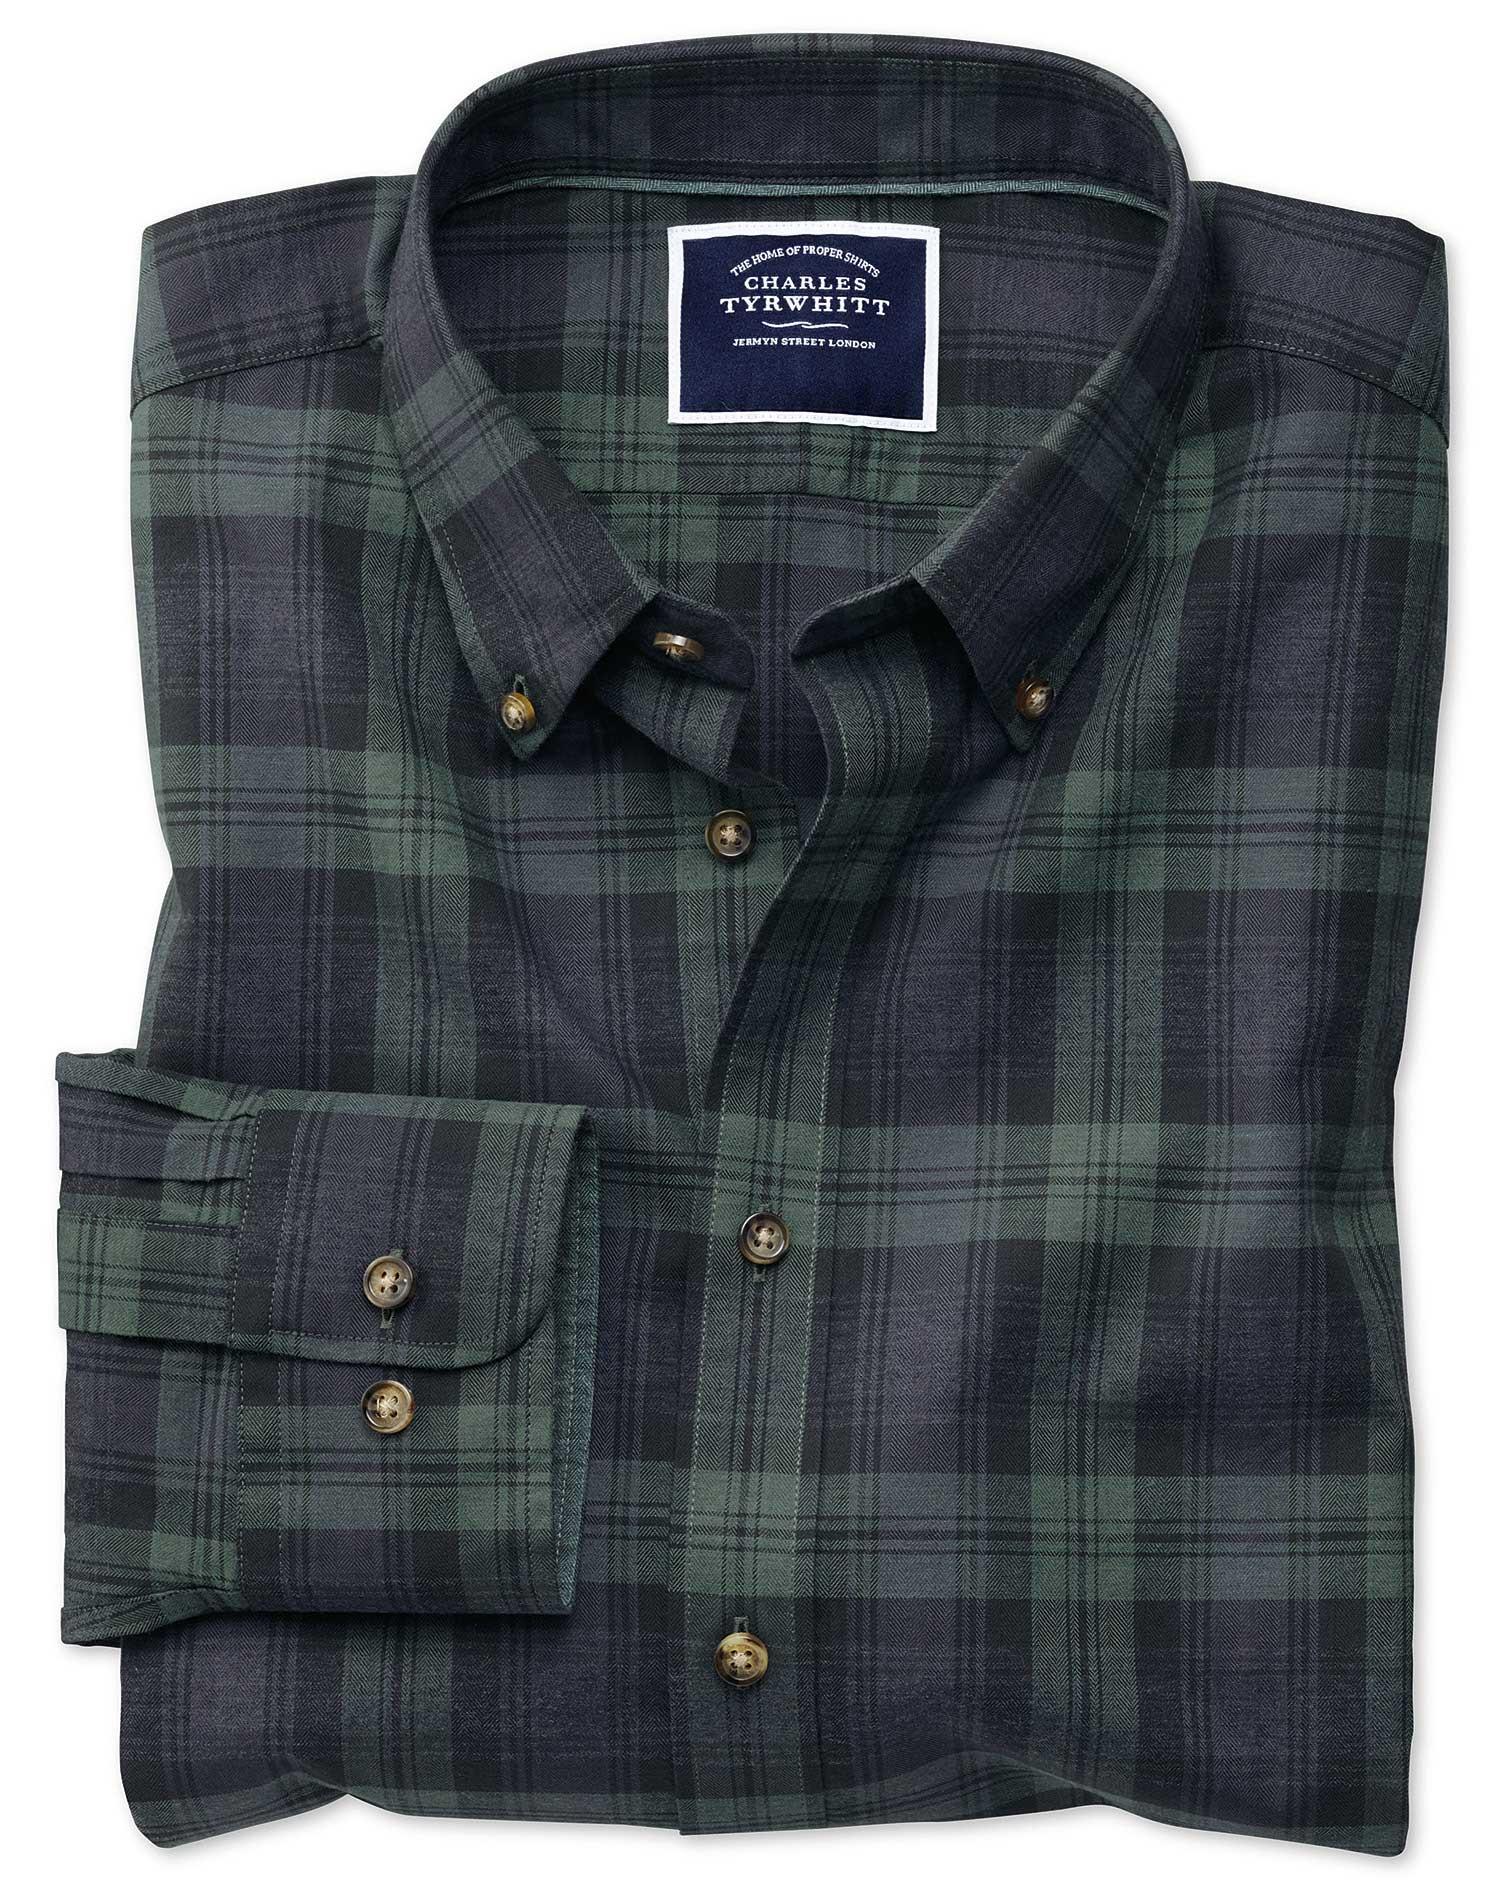 Slim Fit Navy and Green Check Herringbone Melange Cotton Shirt Single Cuff Size Medium by Charles Ty